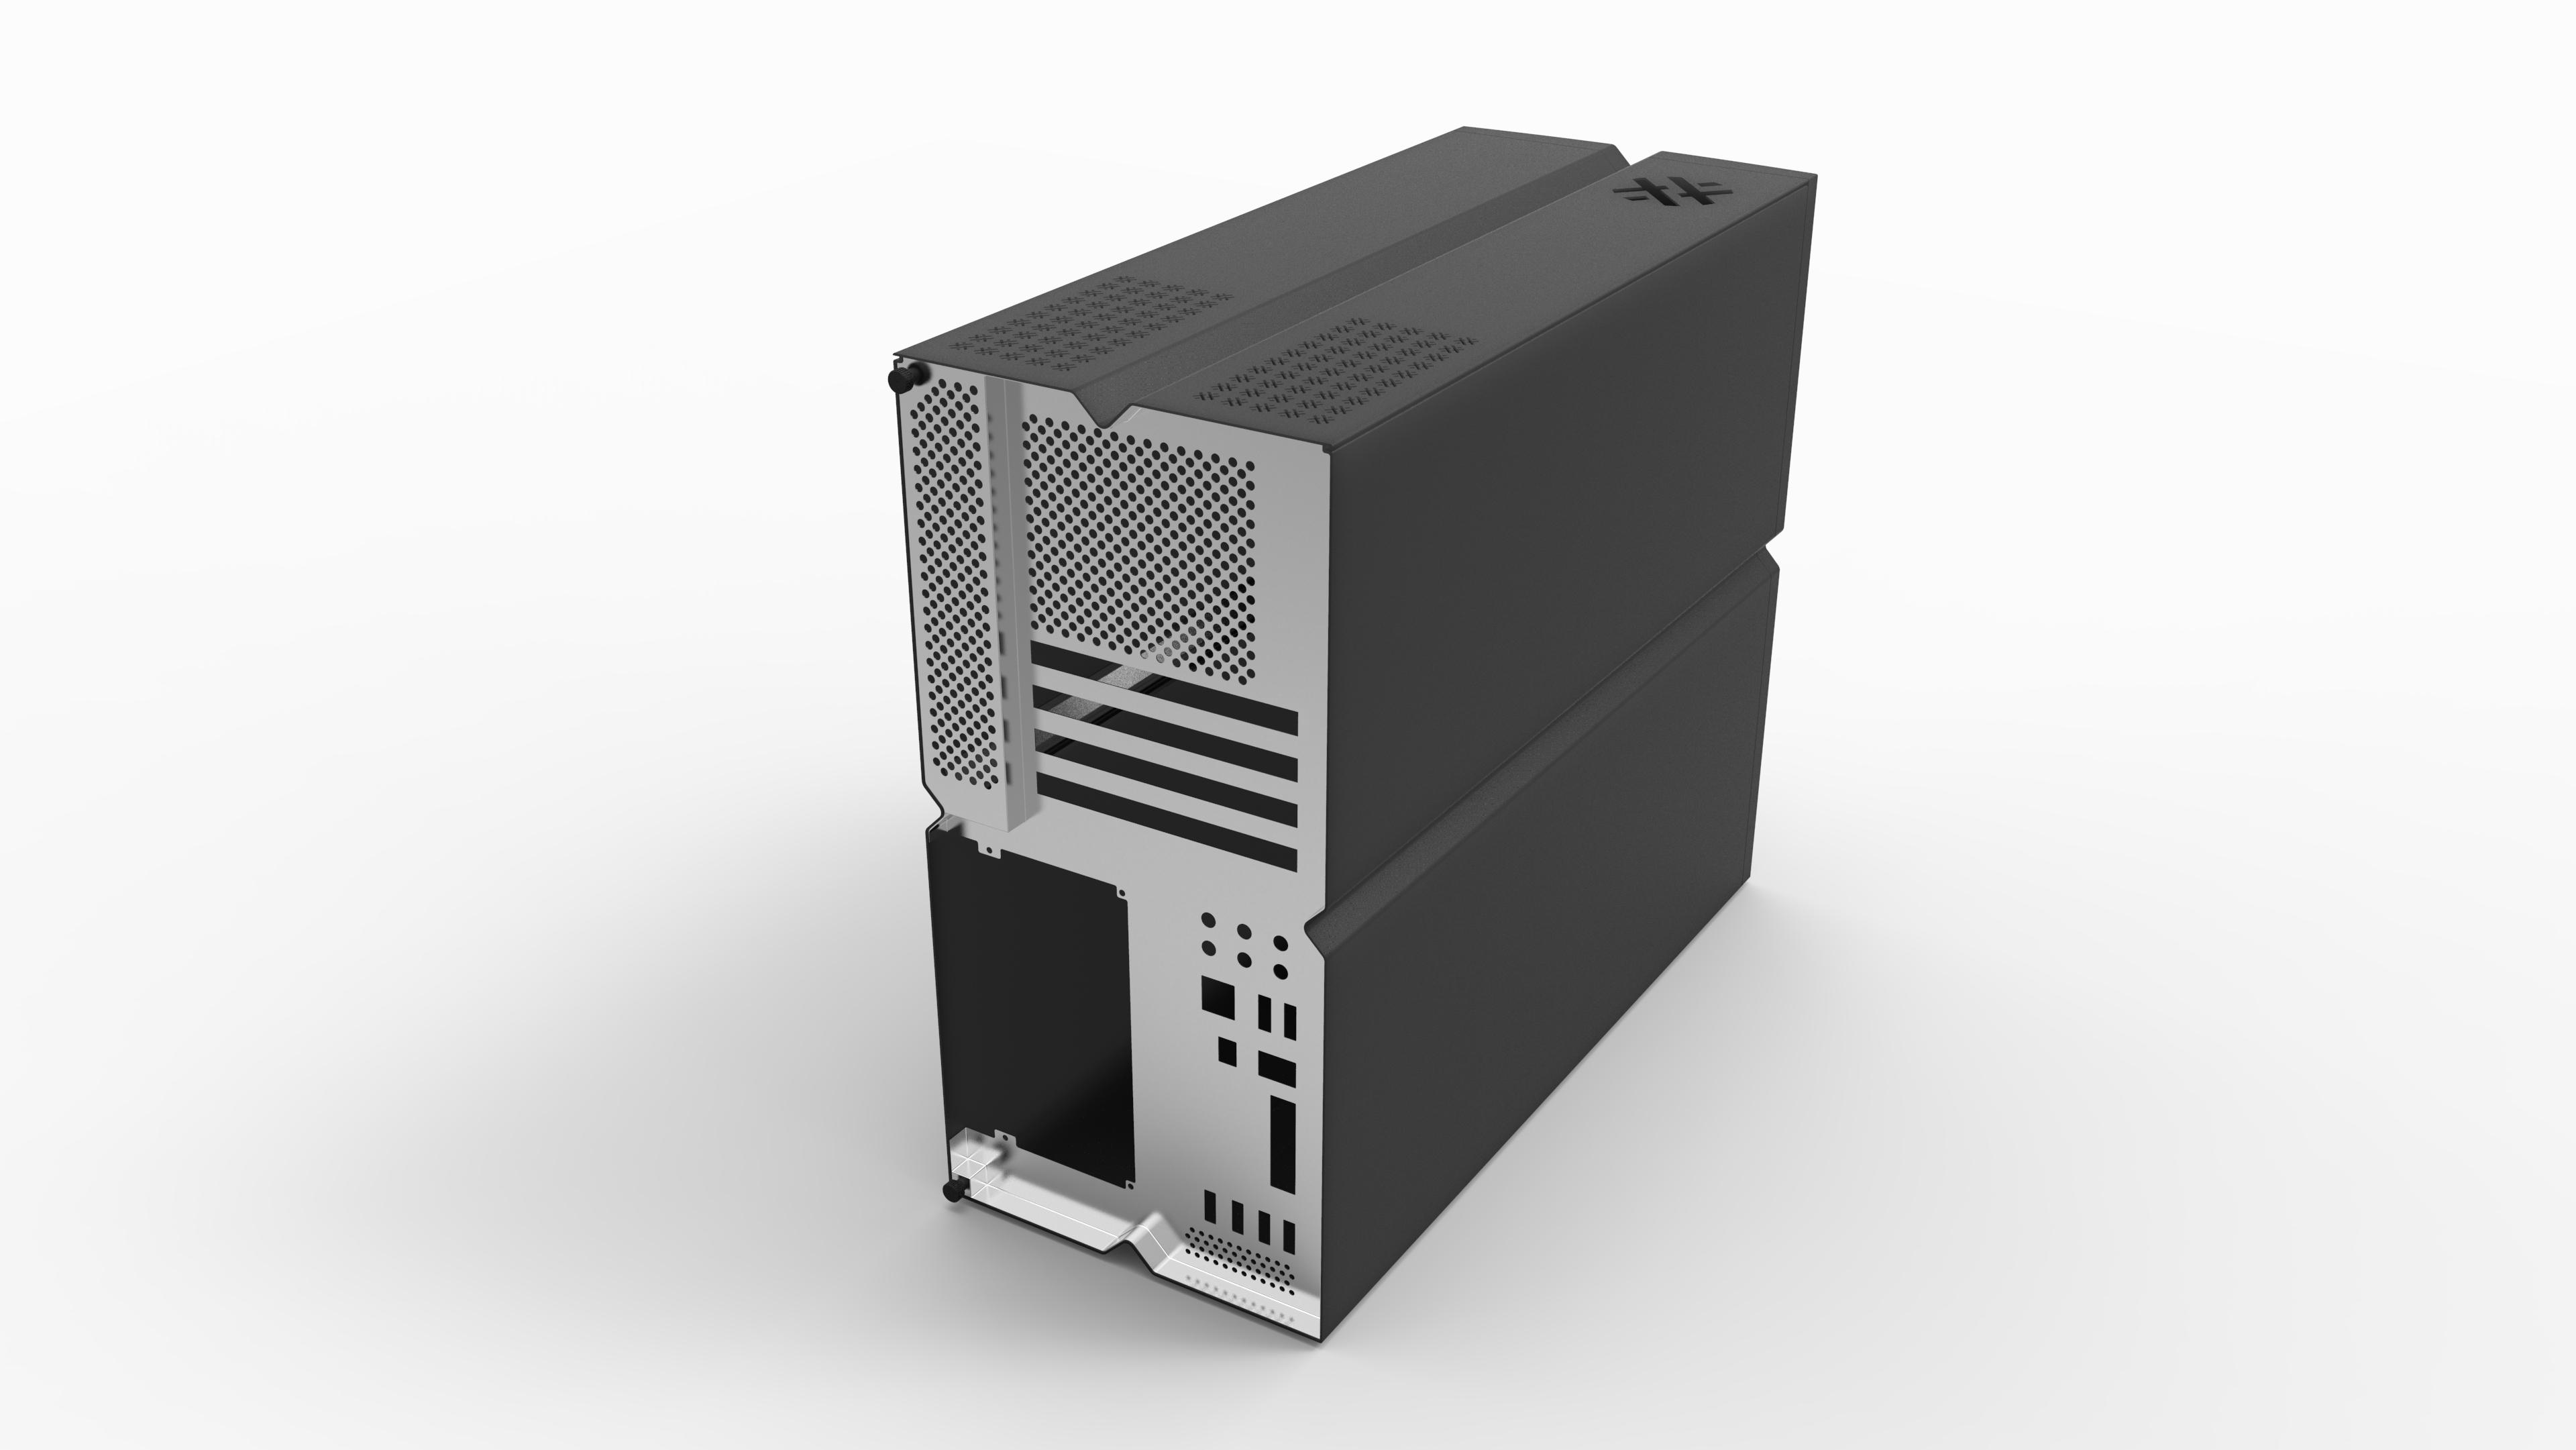 4K-BOXX_Workstation_X-Generation-05.jpg